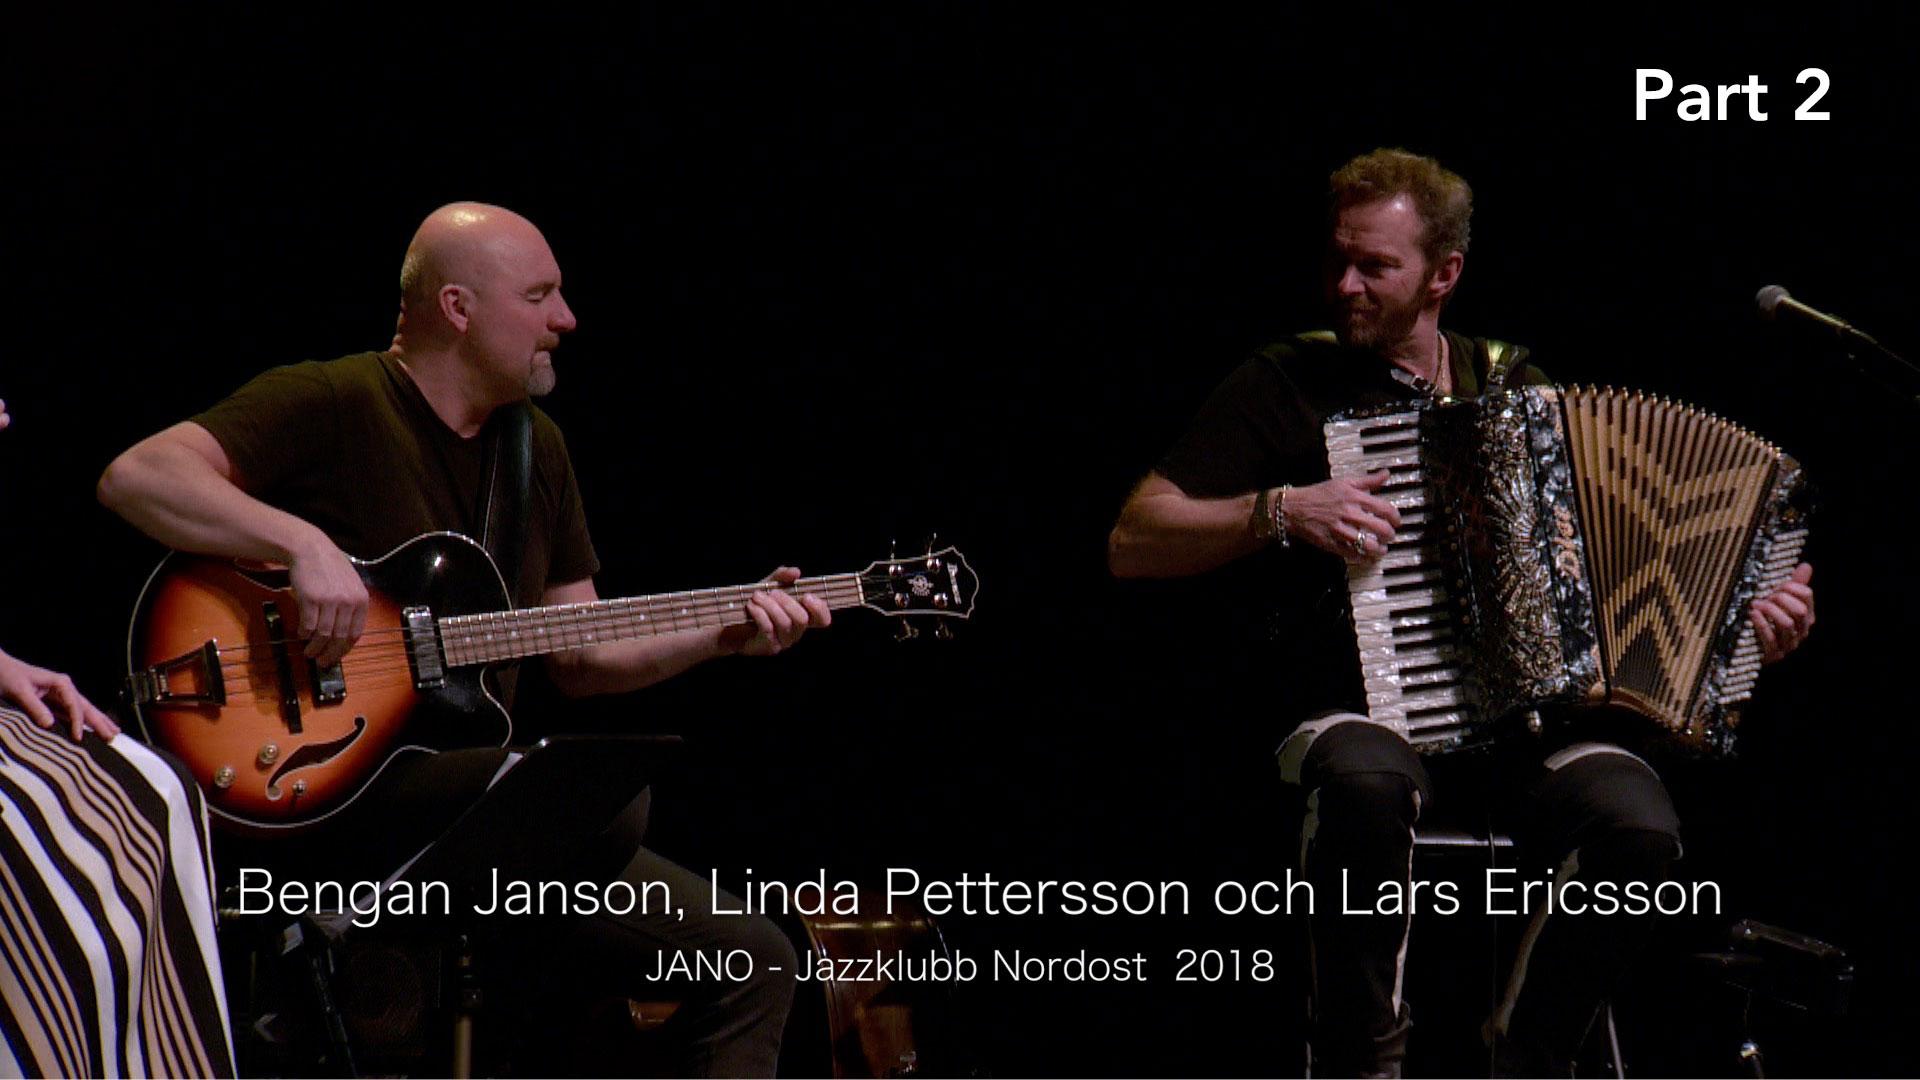 Bengan Jansson, Linda Pettersson and Lars Ericsson